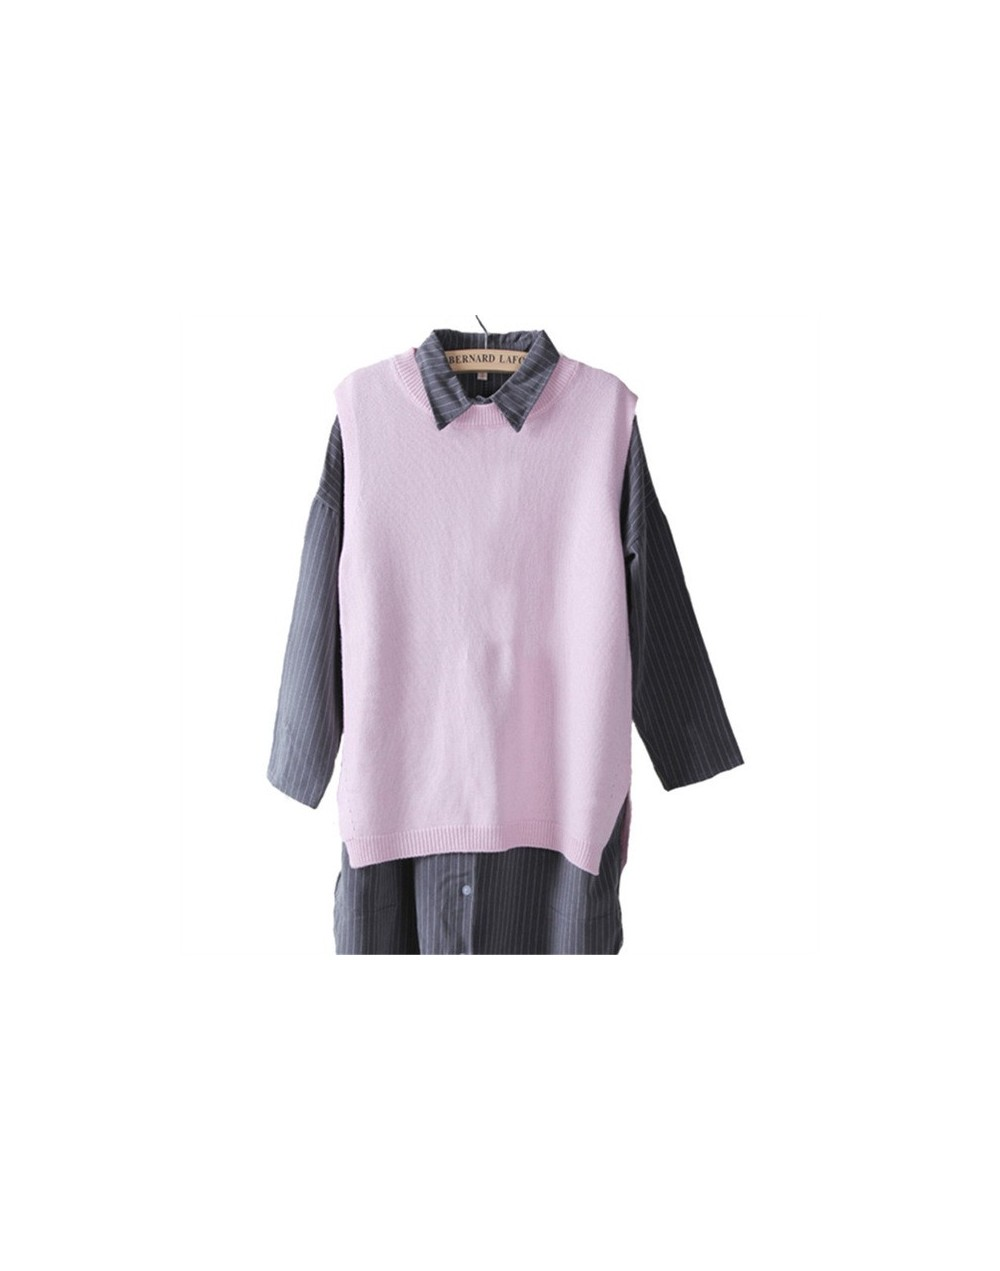 Women Winter&Autumn O-Neck Cashmere Blend Sleeveless Vest Sweater Korean Style Fashion Lady Knitwear Jumper - pink - 4O35441...